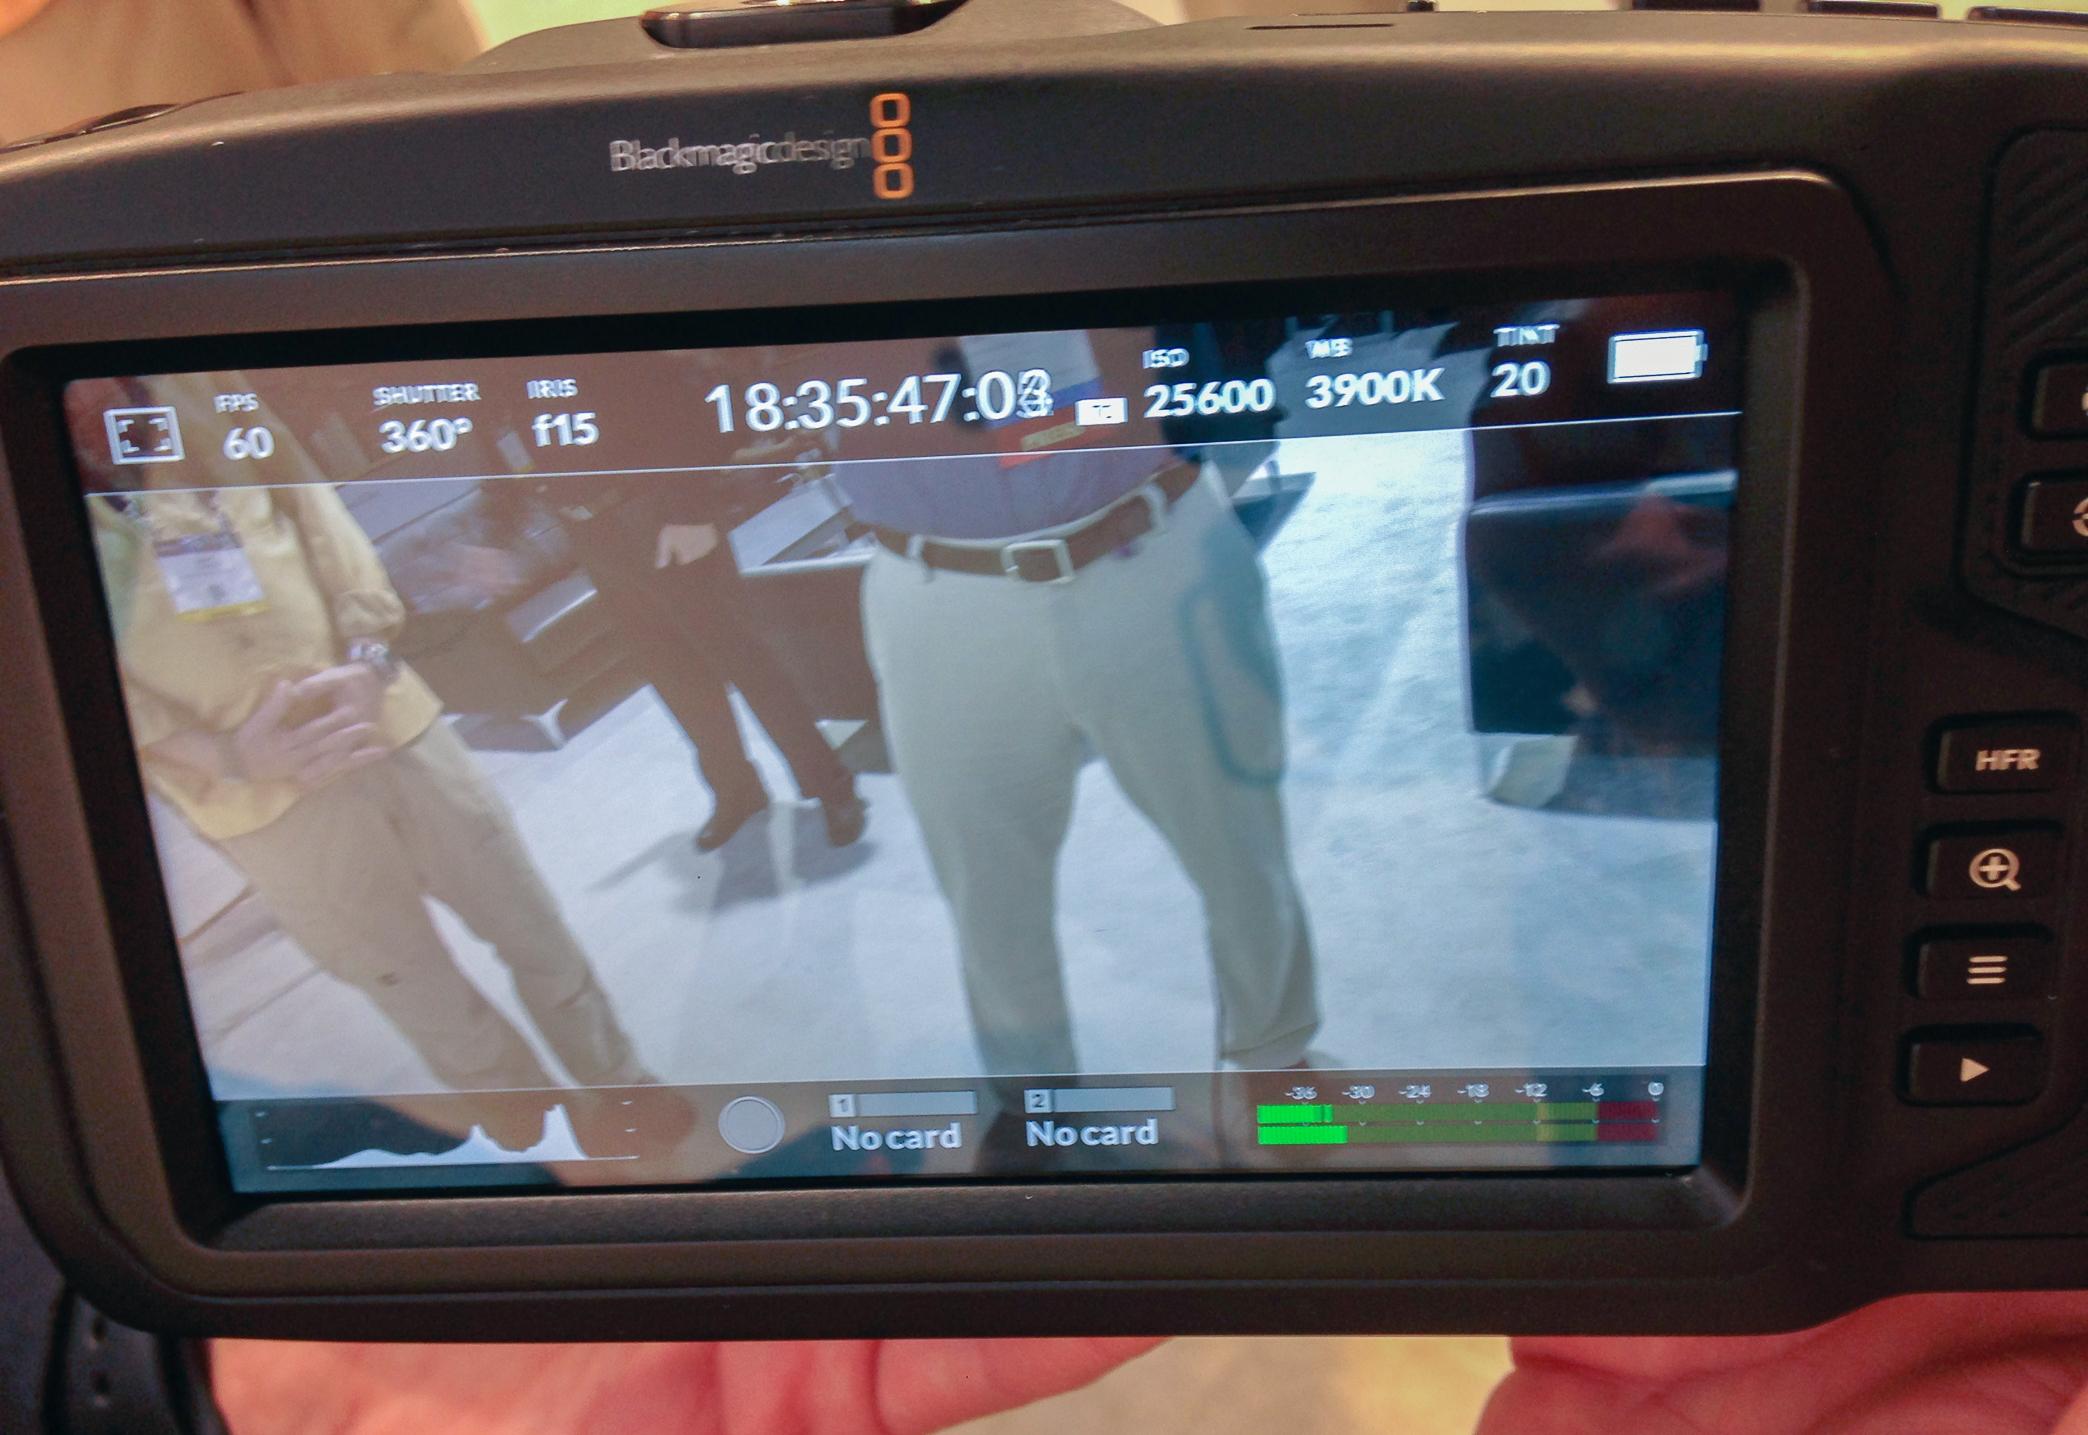 NAB 2018: Blackmagic Design Pocket Cinema Camera 4K Video